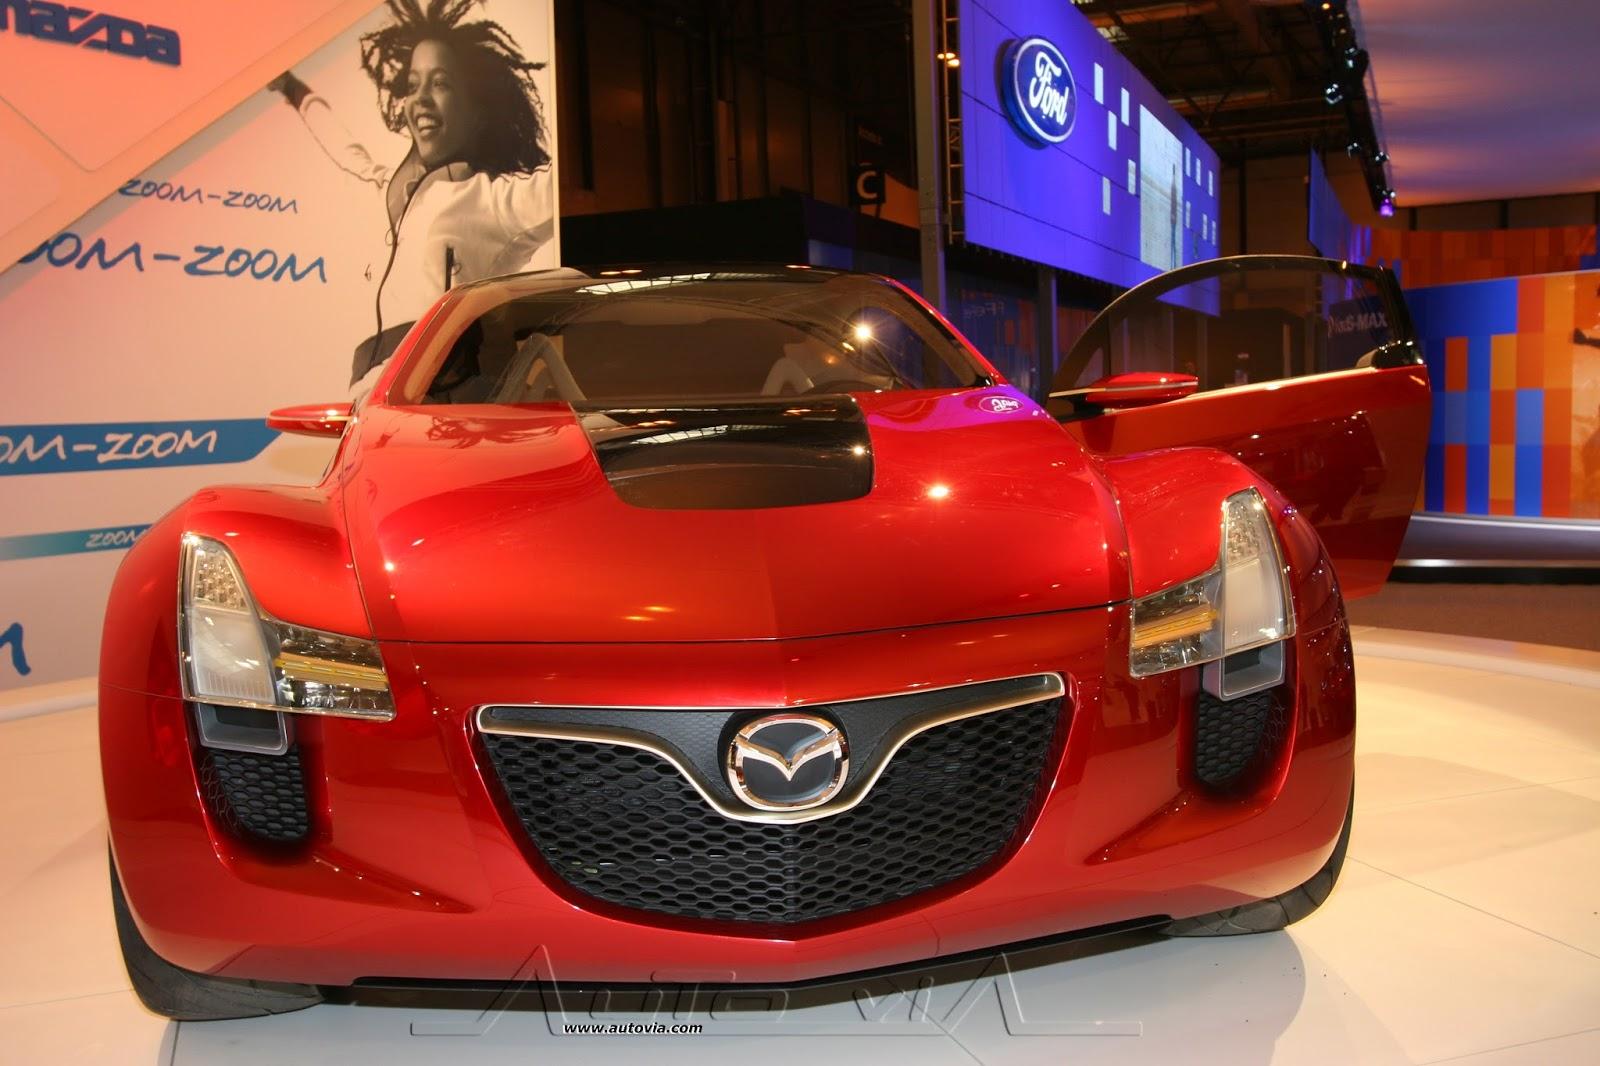 RX5KABURA Τριρότορο, biturbo, με 450 άλογα, το Mazda RX-9 ετοιμάζεται να φτύσει φλόγες concept, Mazda, Mazda RX-9, RX-7, rx-8, Wankel, zblog